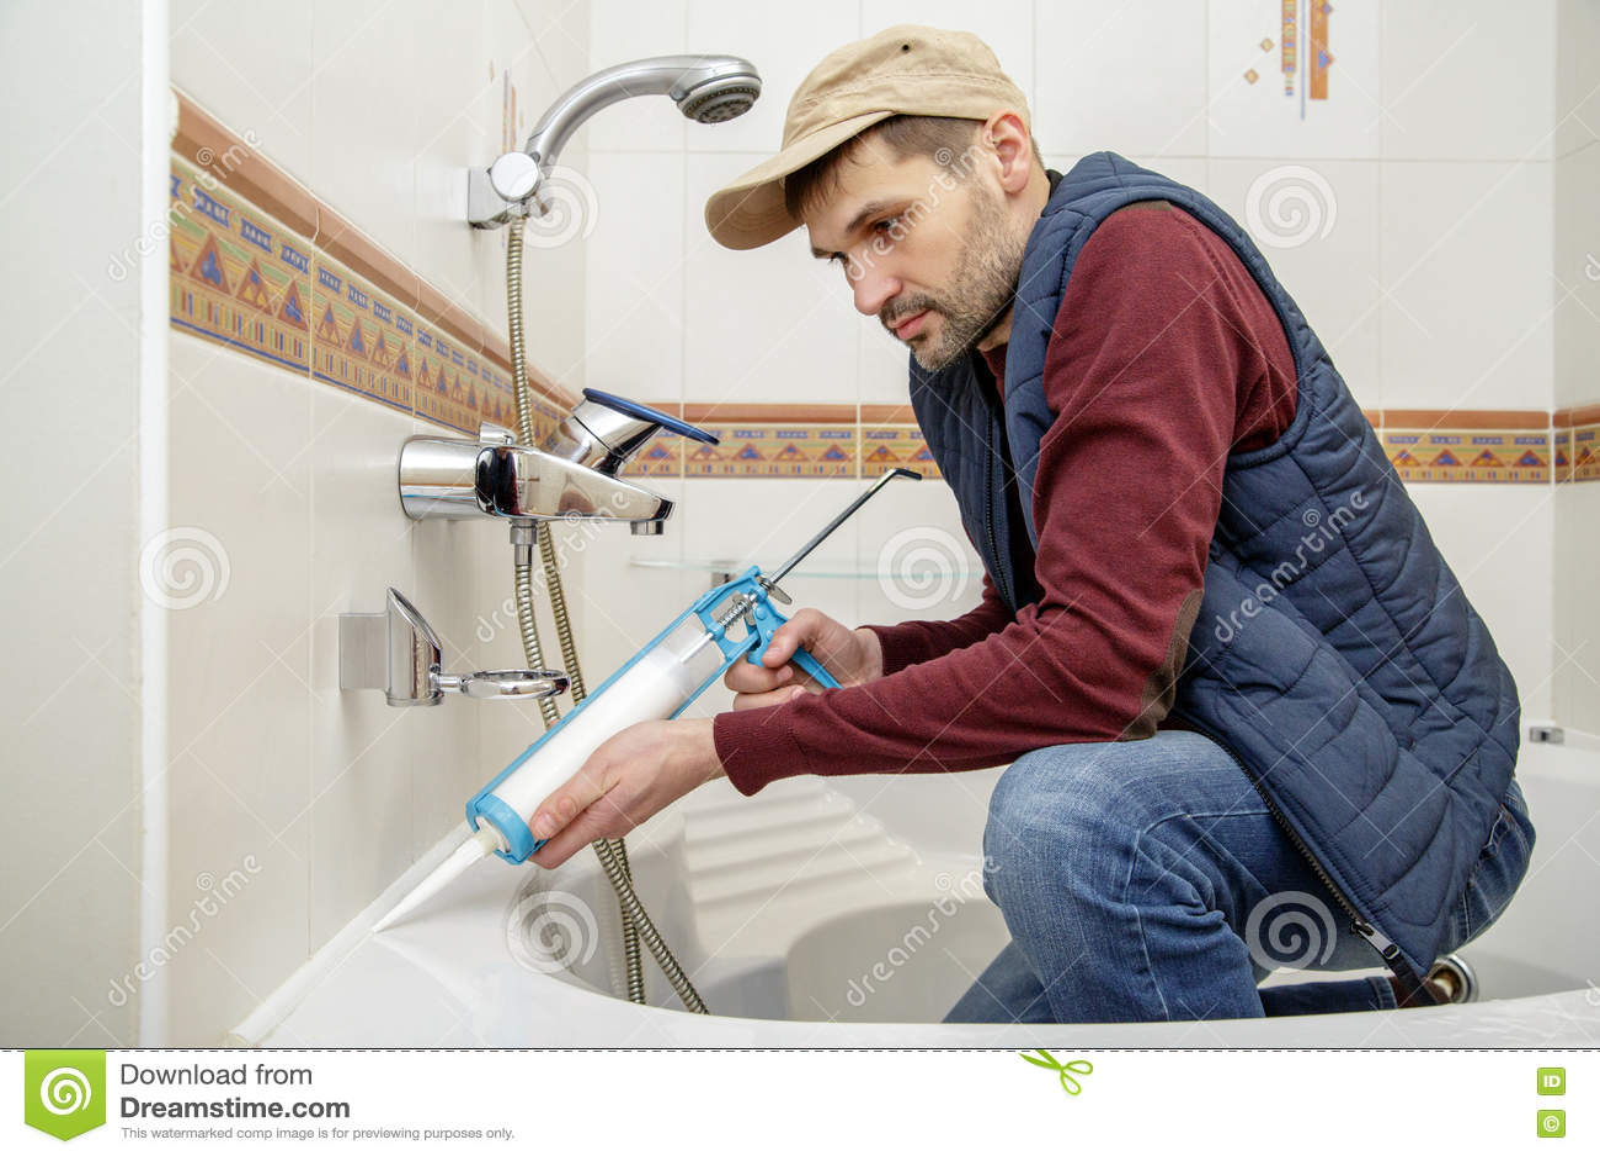 Man applying silicone sealant in the bathroom stock photo for Bathroom caulking service